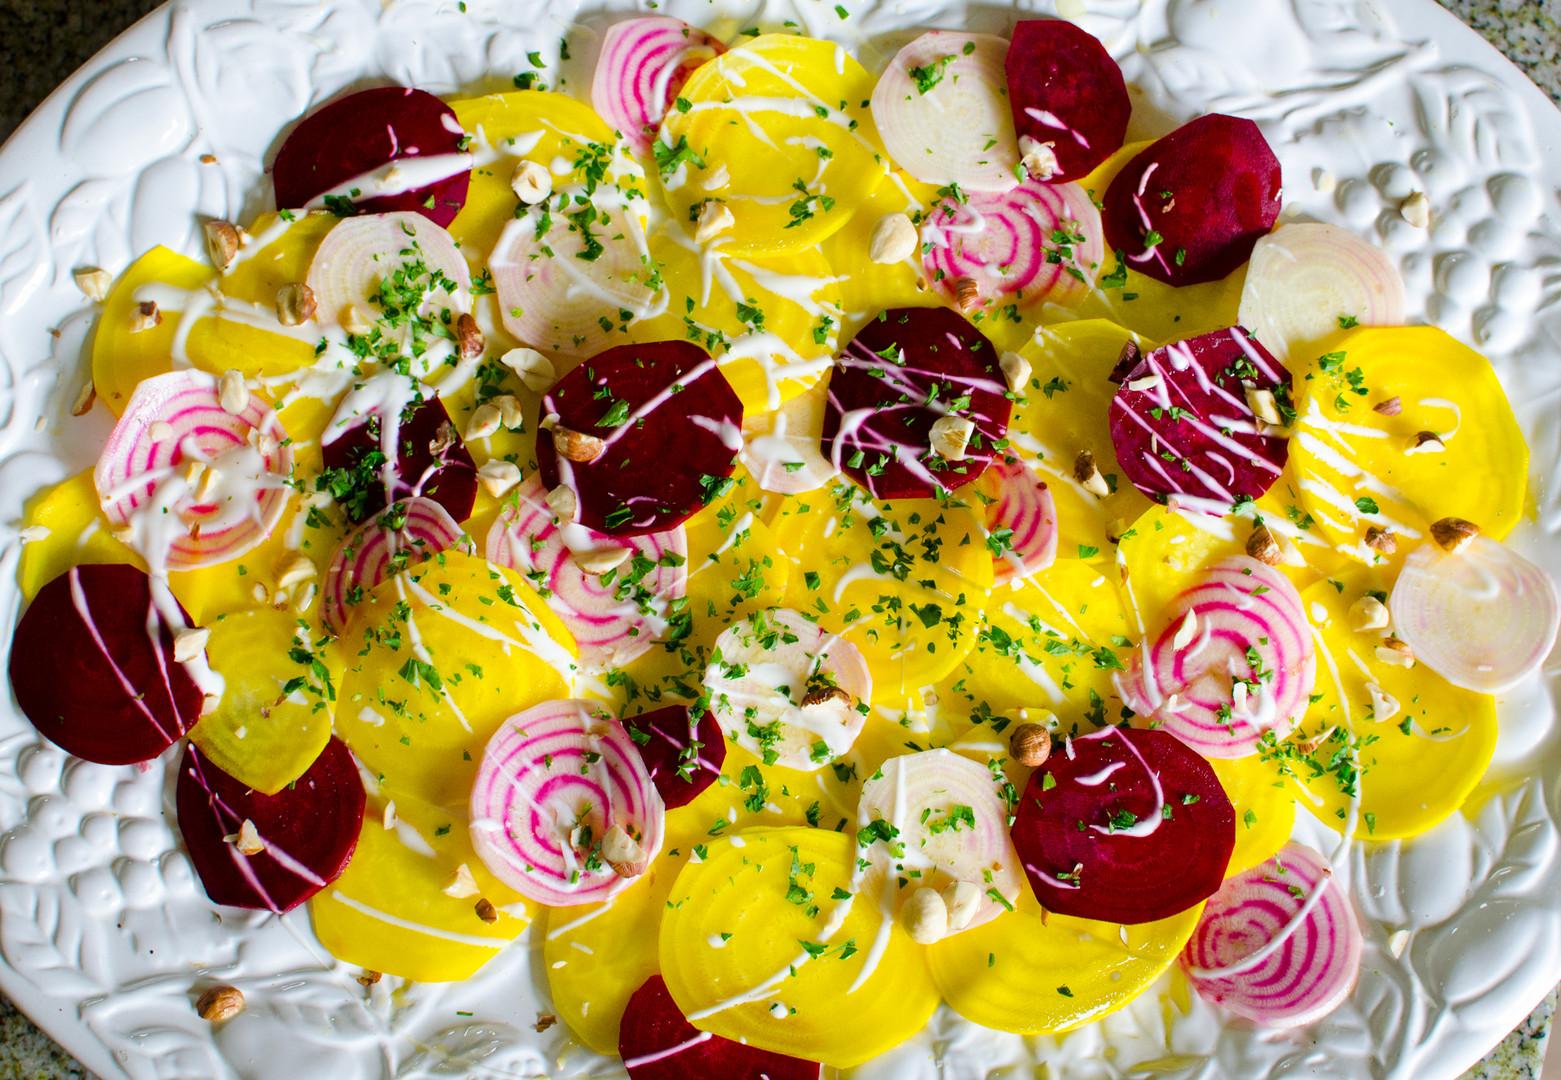 Marinated Beet Salad with Hazelnuts, Herbs, Mascarpone Dressing